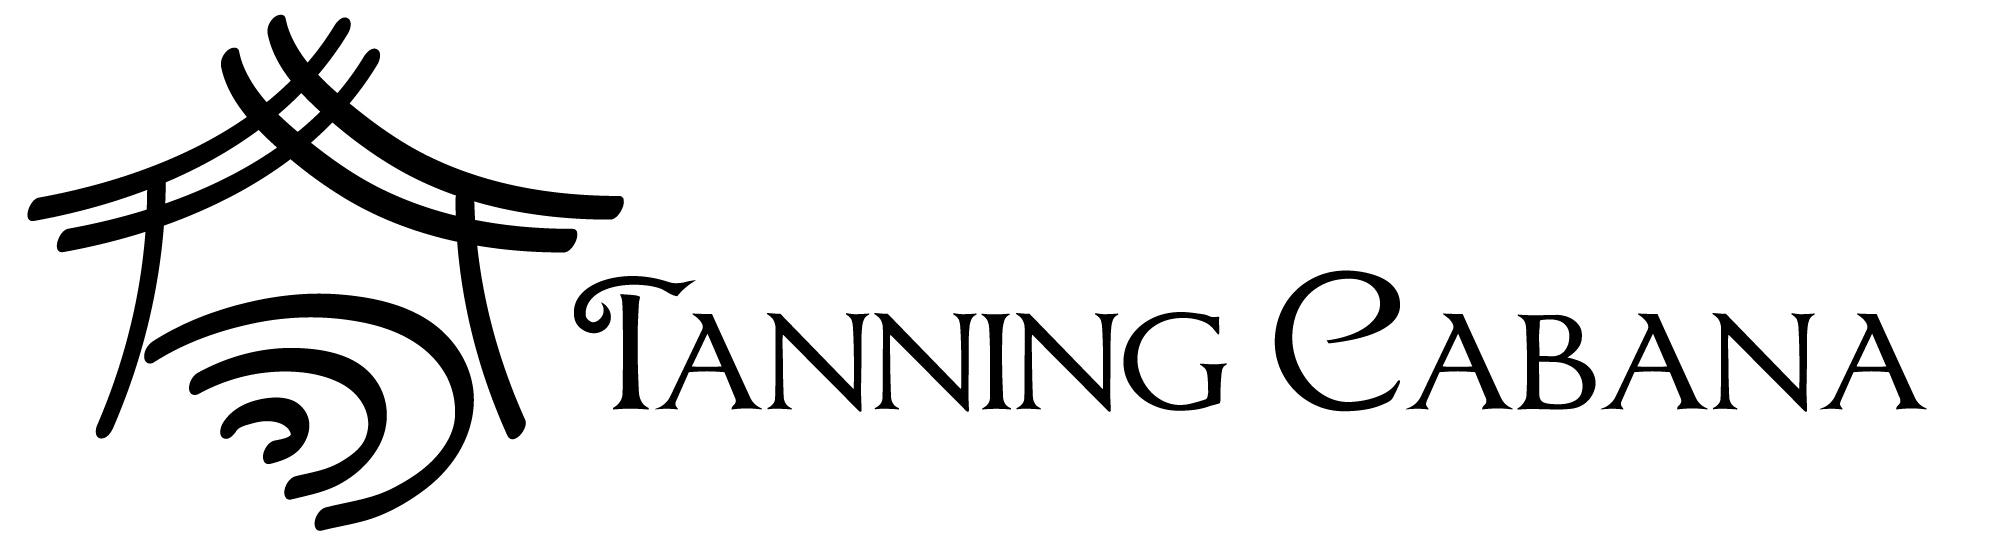 Tanning Cabana